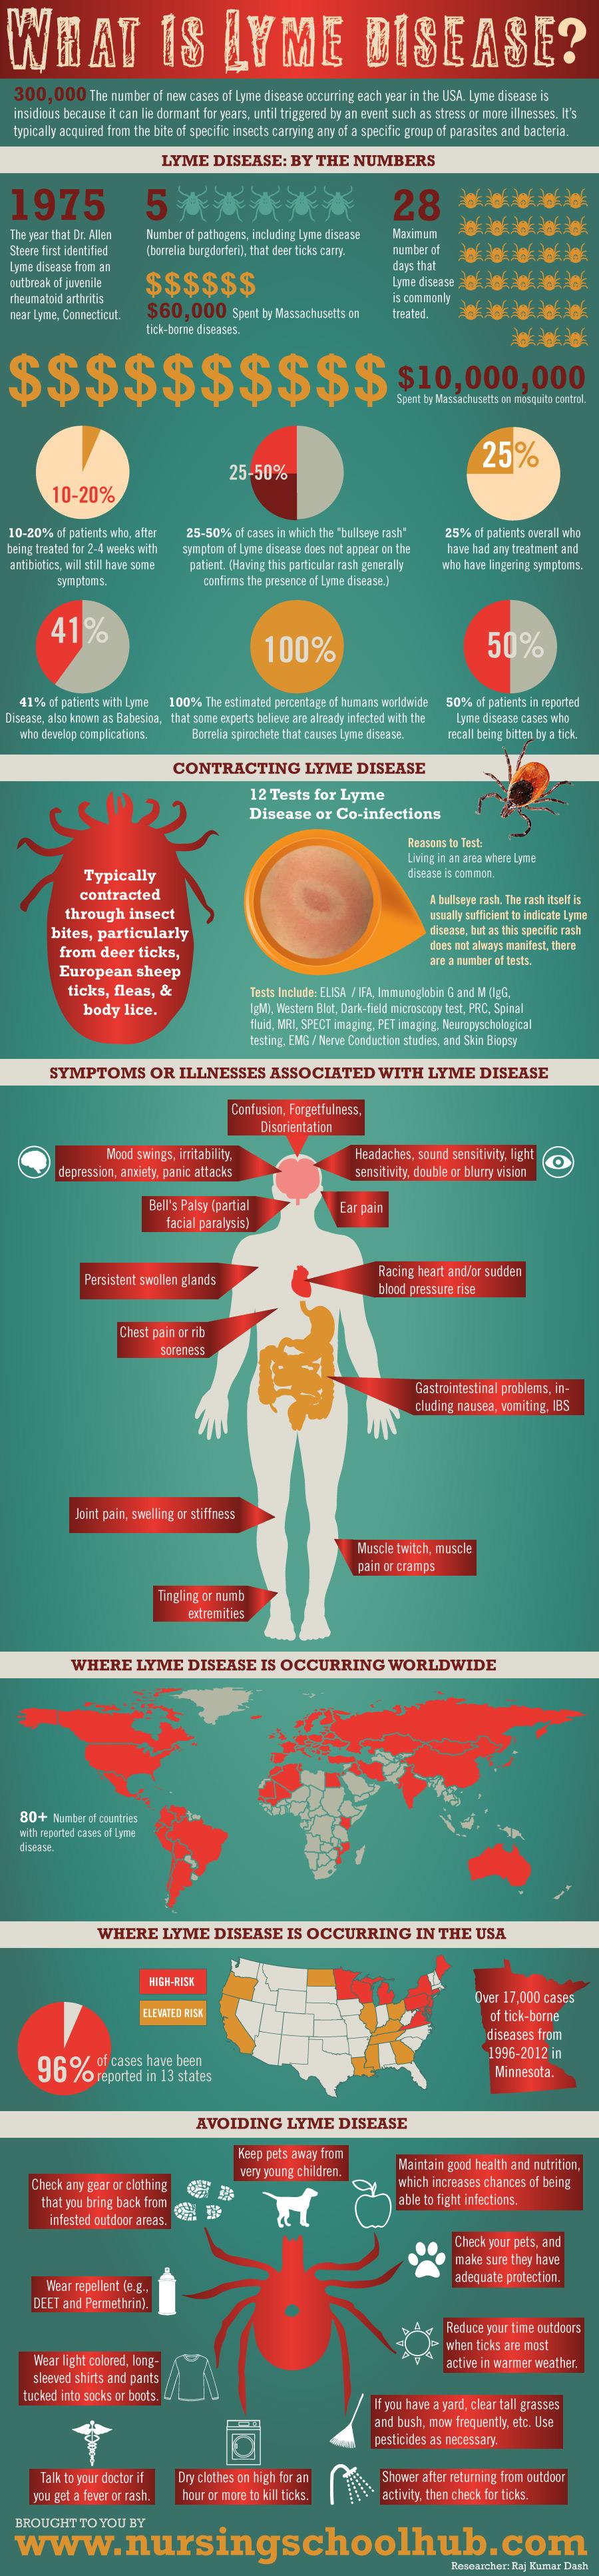 Herxheimer Reaction Symptoms - HRF